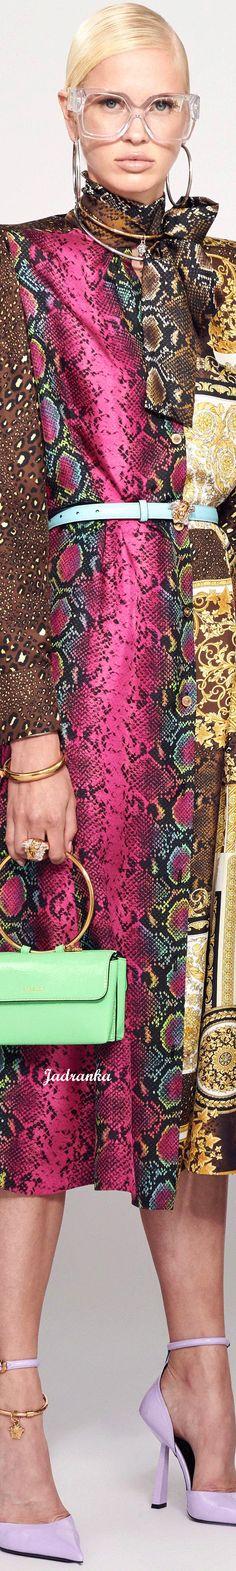 Animal Fashion, Versace, Sequin Skirt, Designers, Sequins, Couture, Skirts, Walkways, Skirt